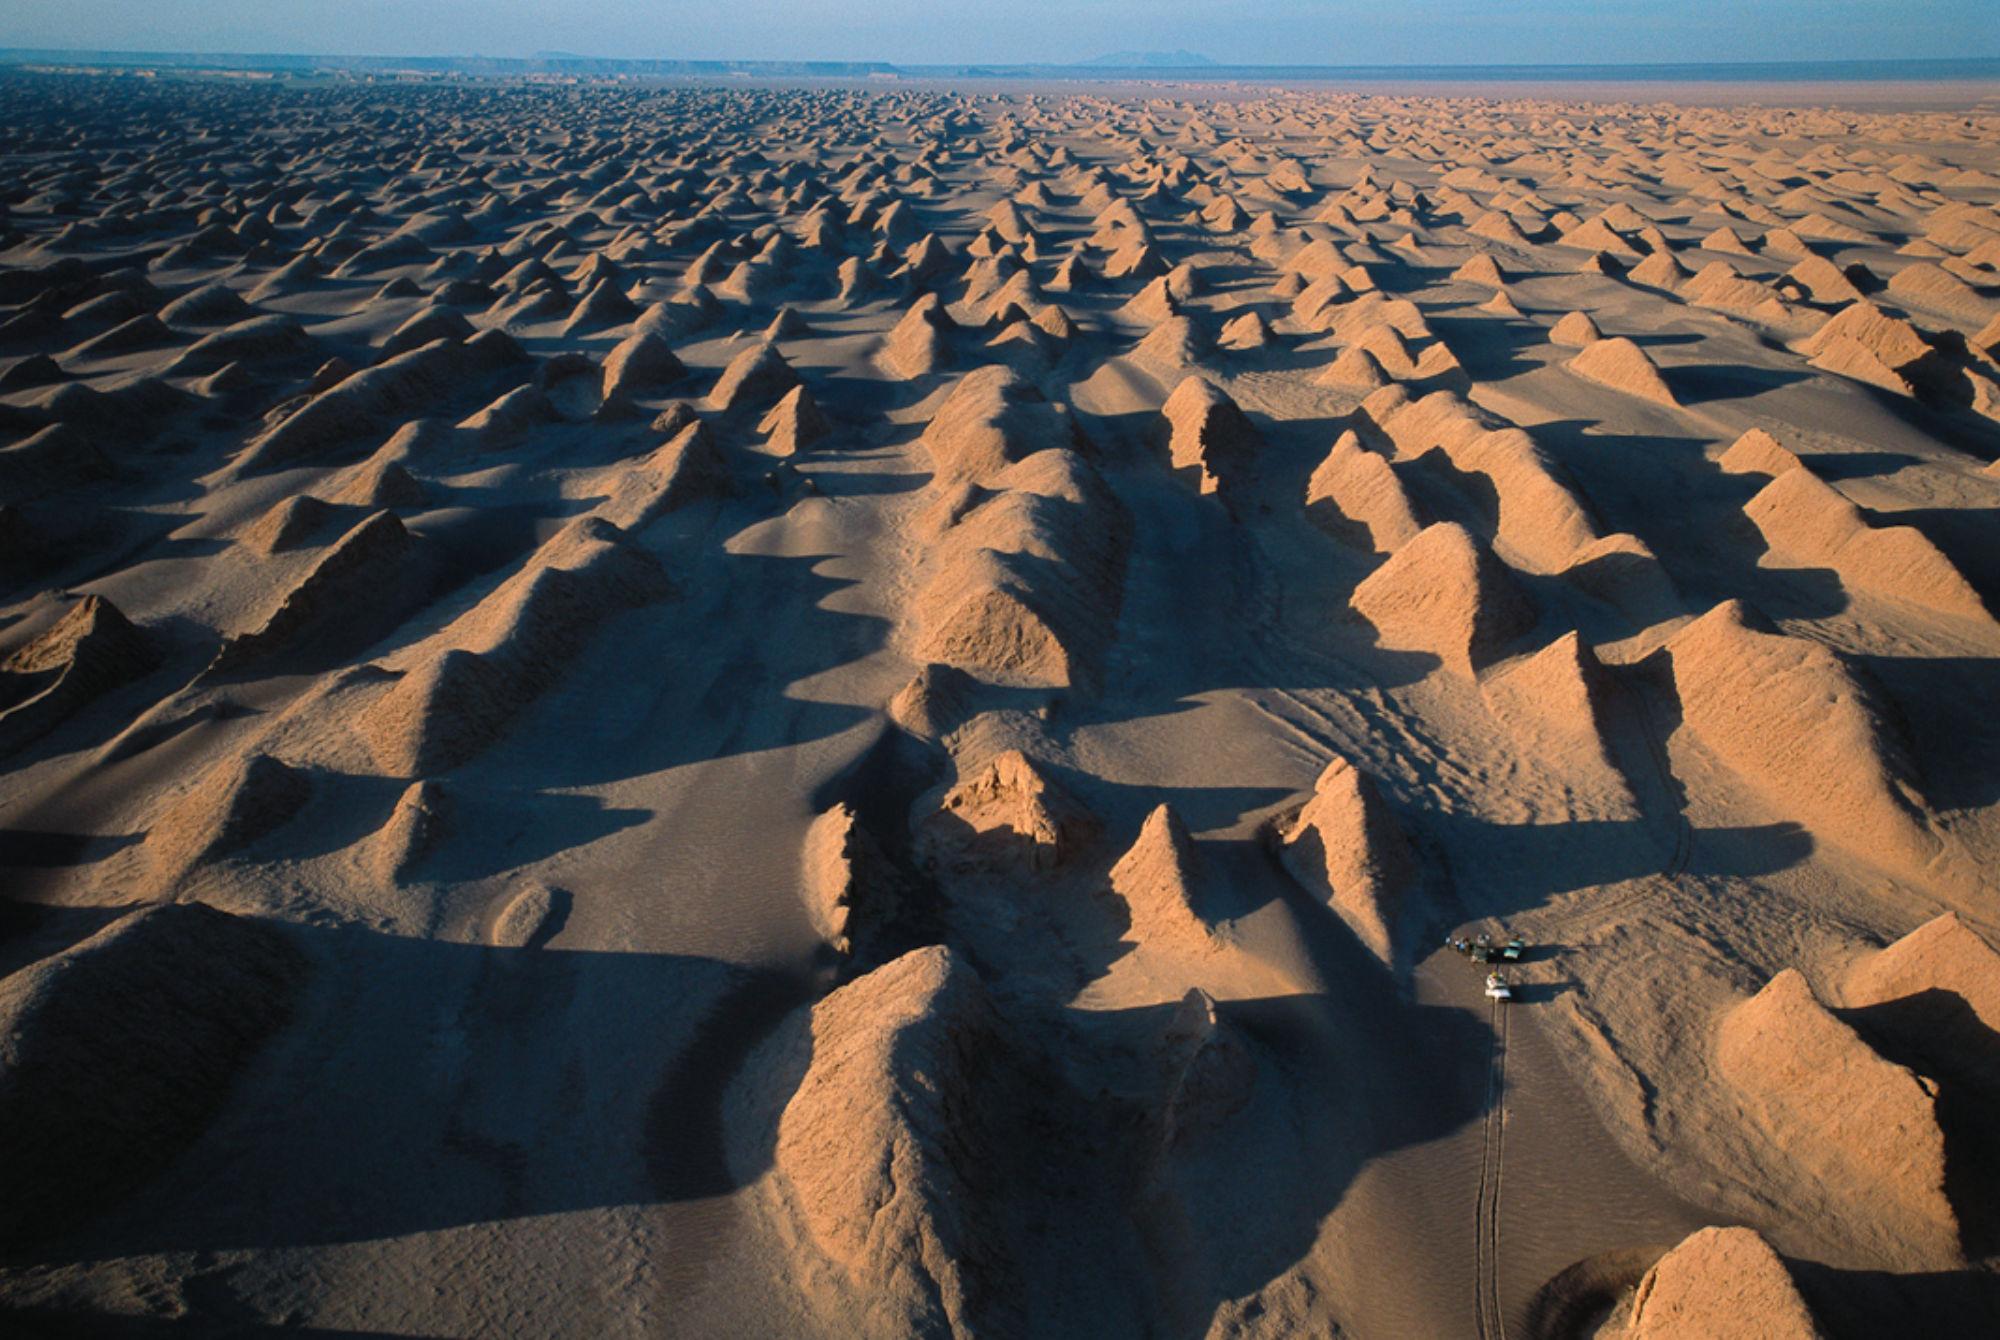 Yardang nel deserto del Lut